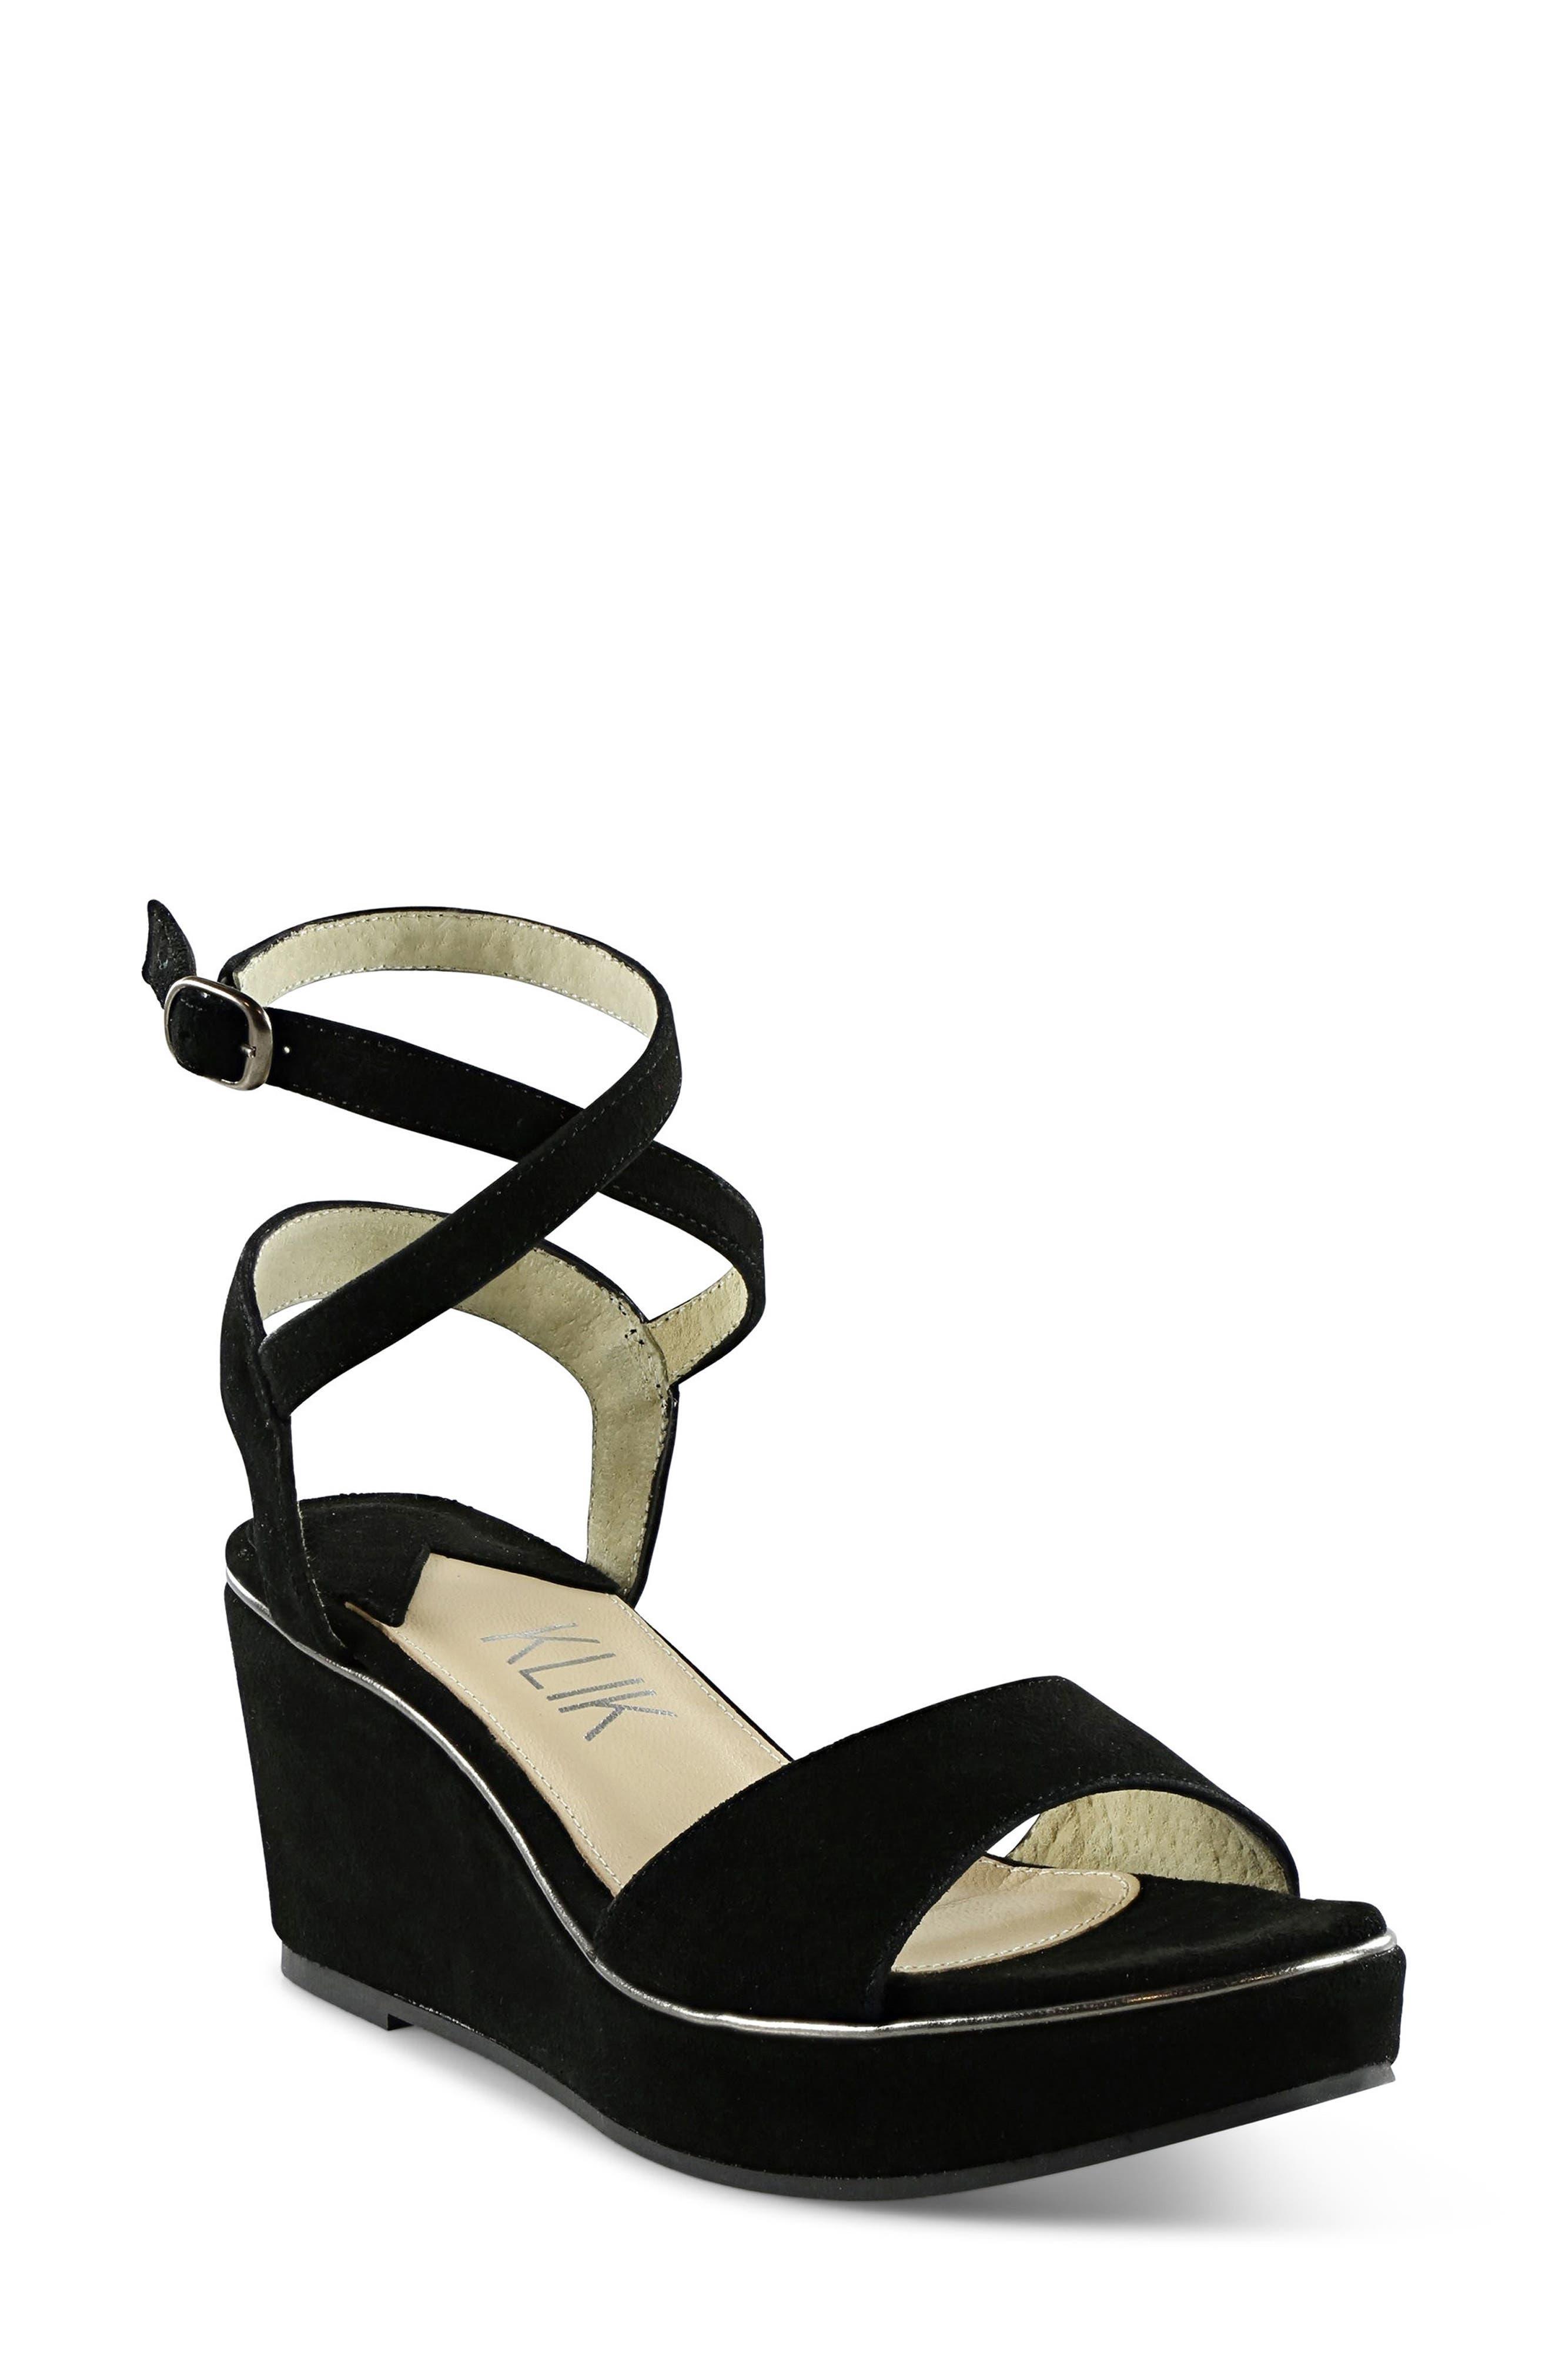 Sashi Platform Sandal,                             Main thumbnail 1, color,                             Black Suede